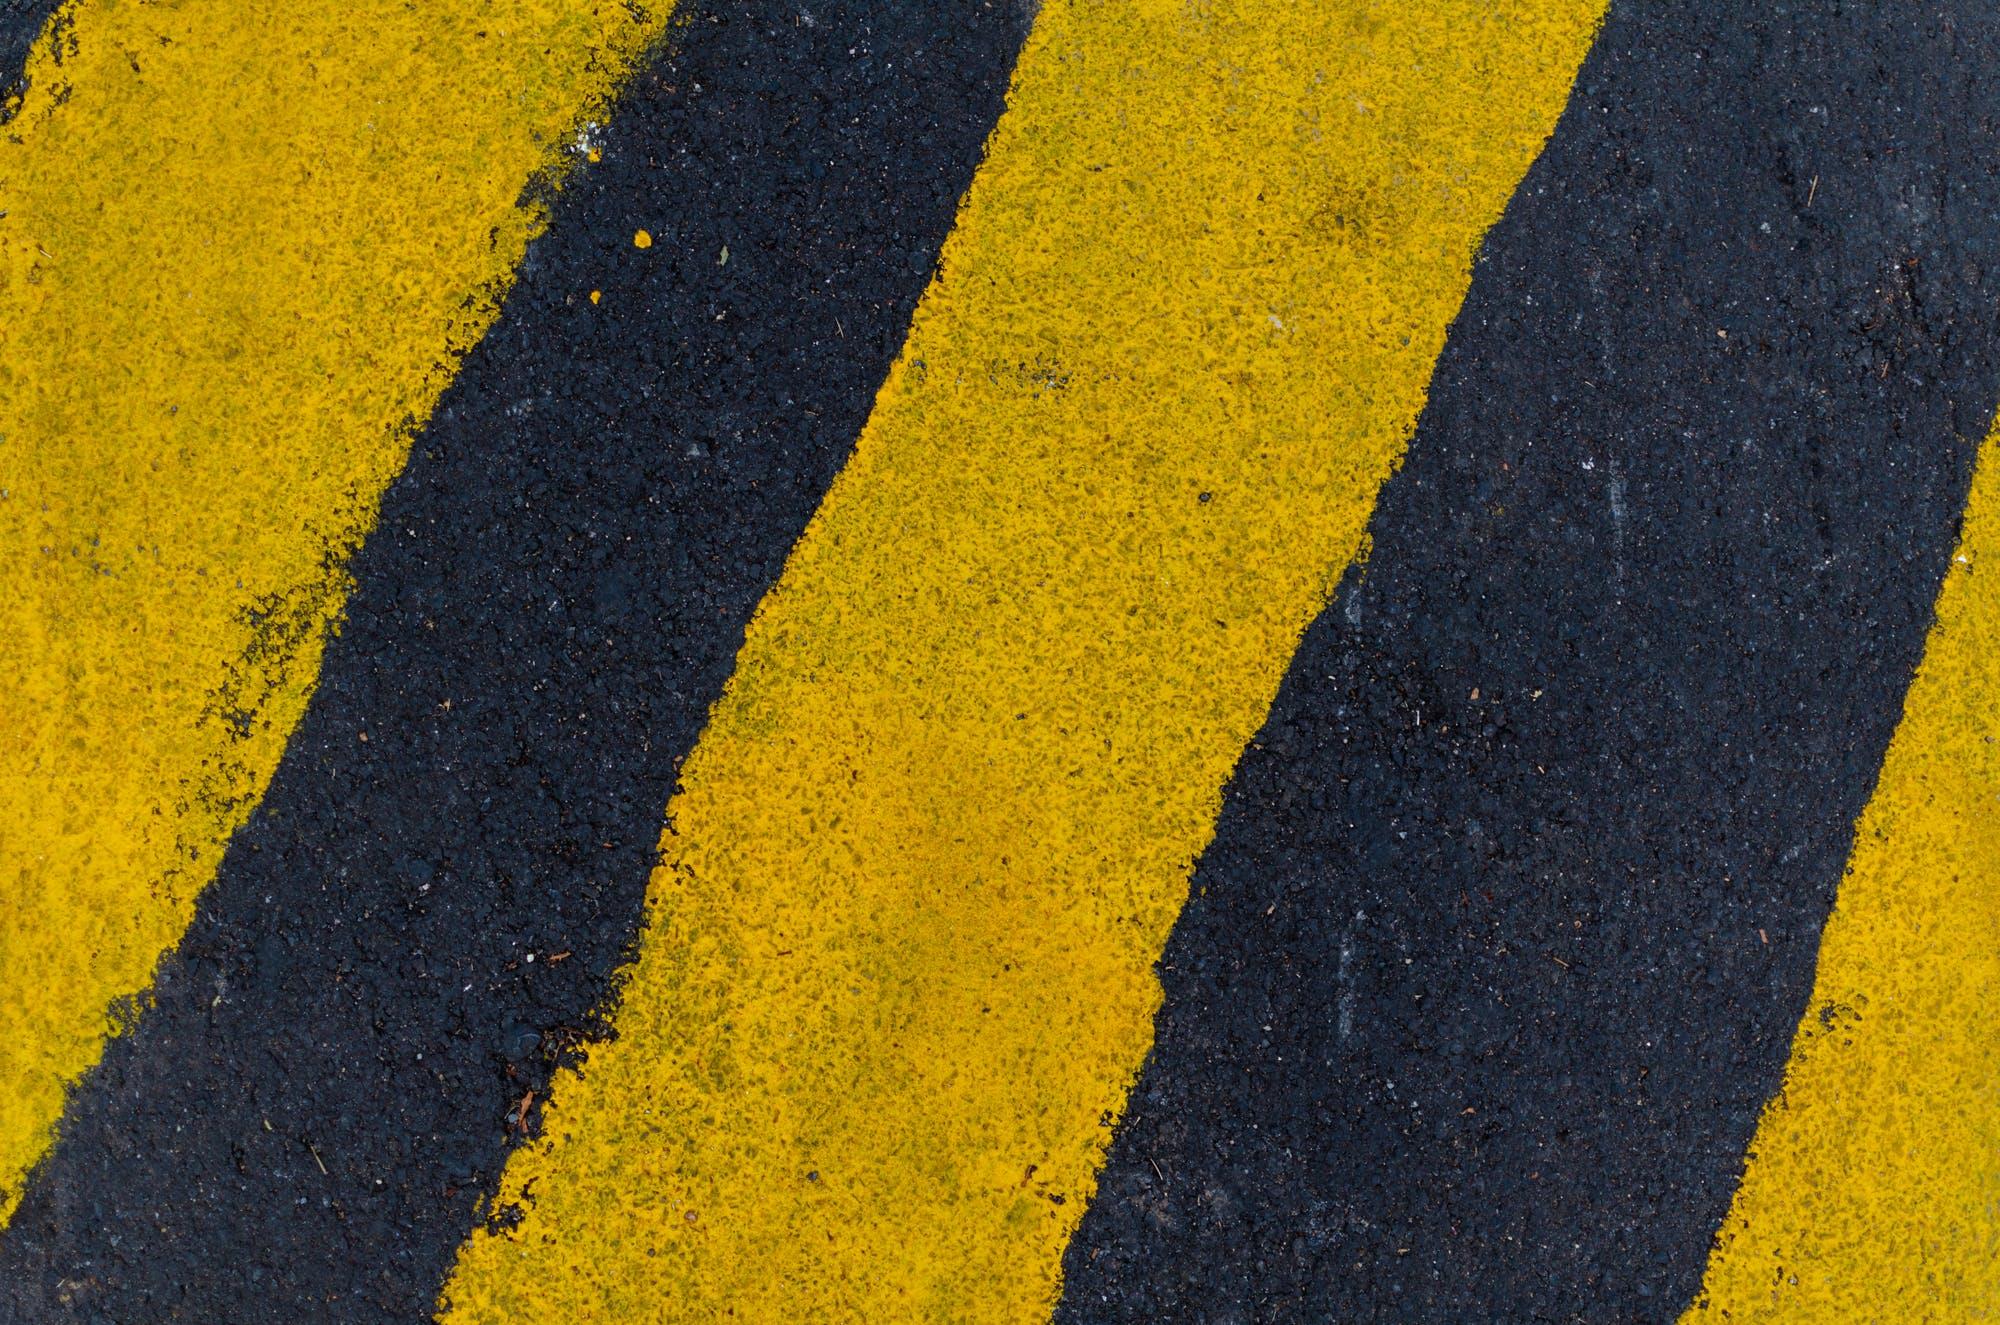 Yellow and Black Pedestrian Lane